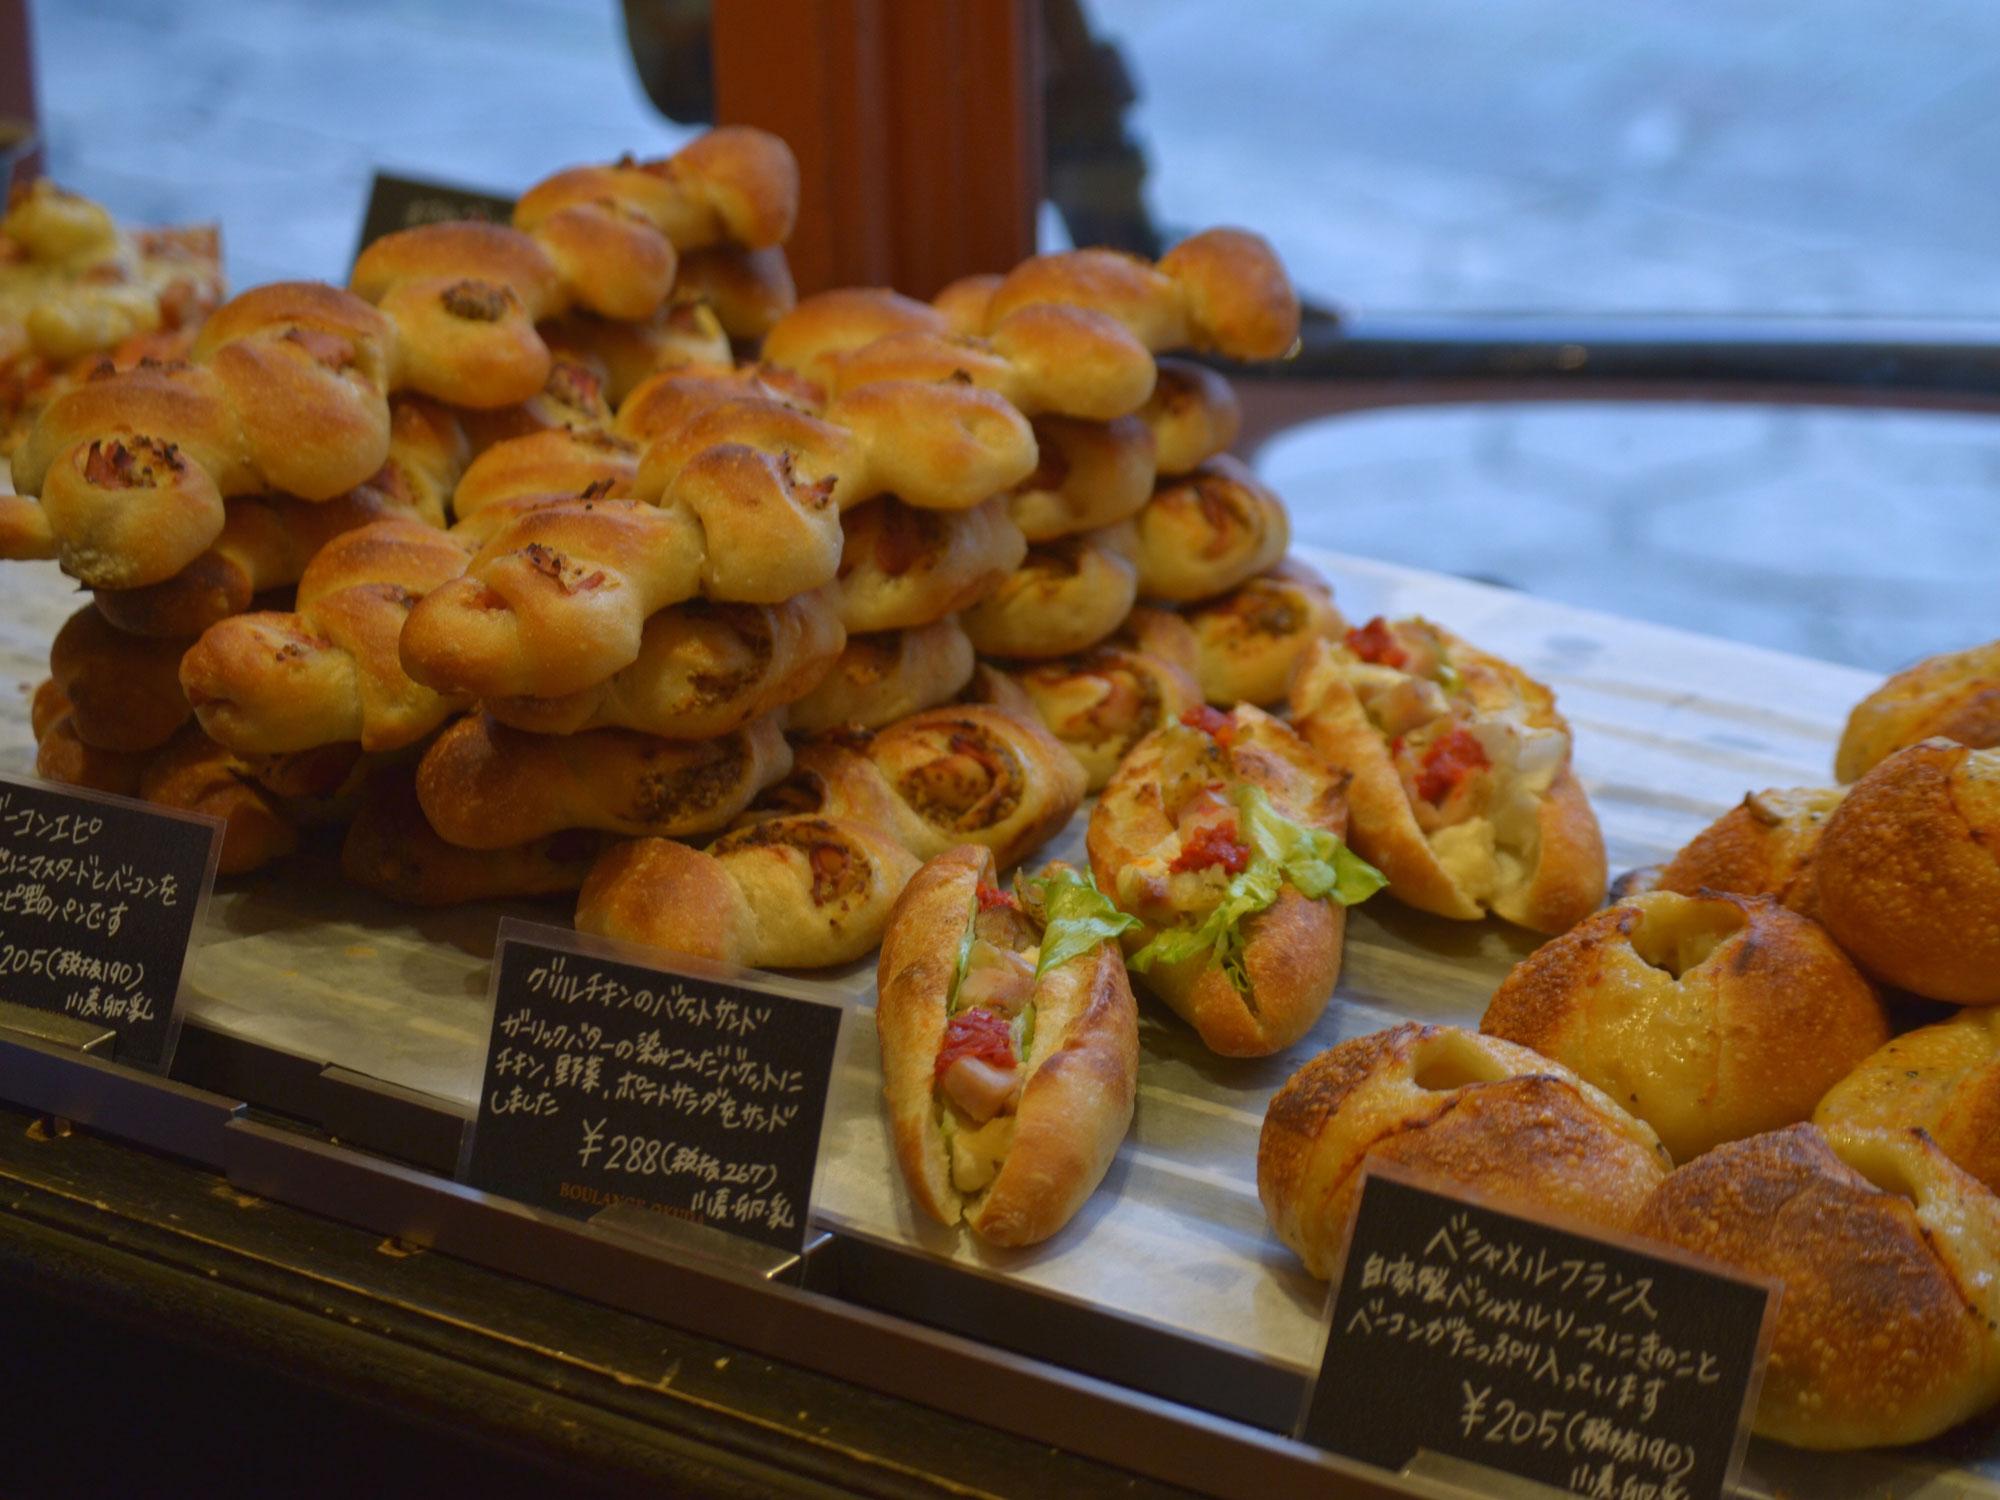 Baked treats in a bakery in Kyoto.